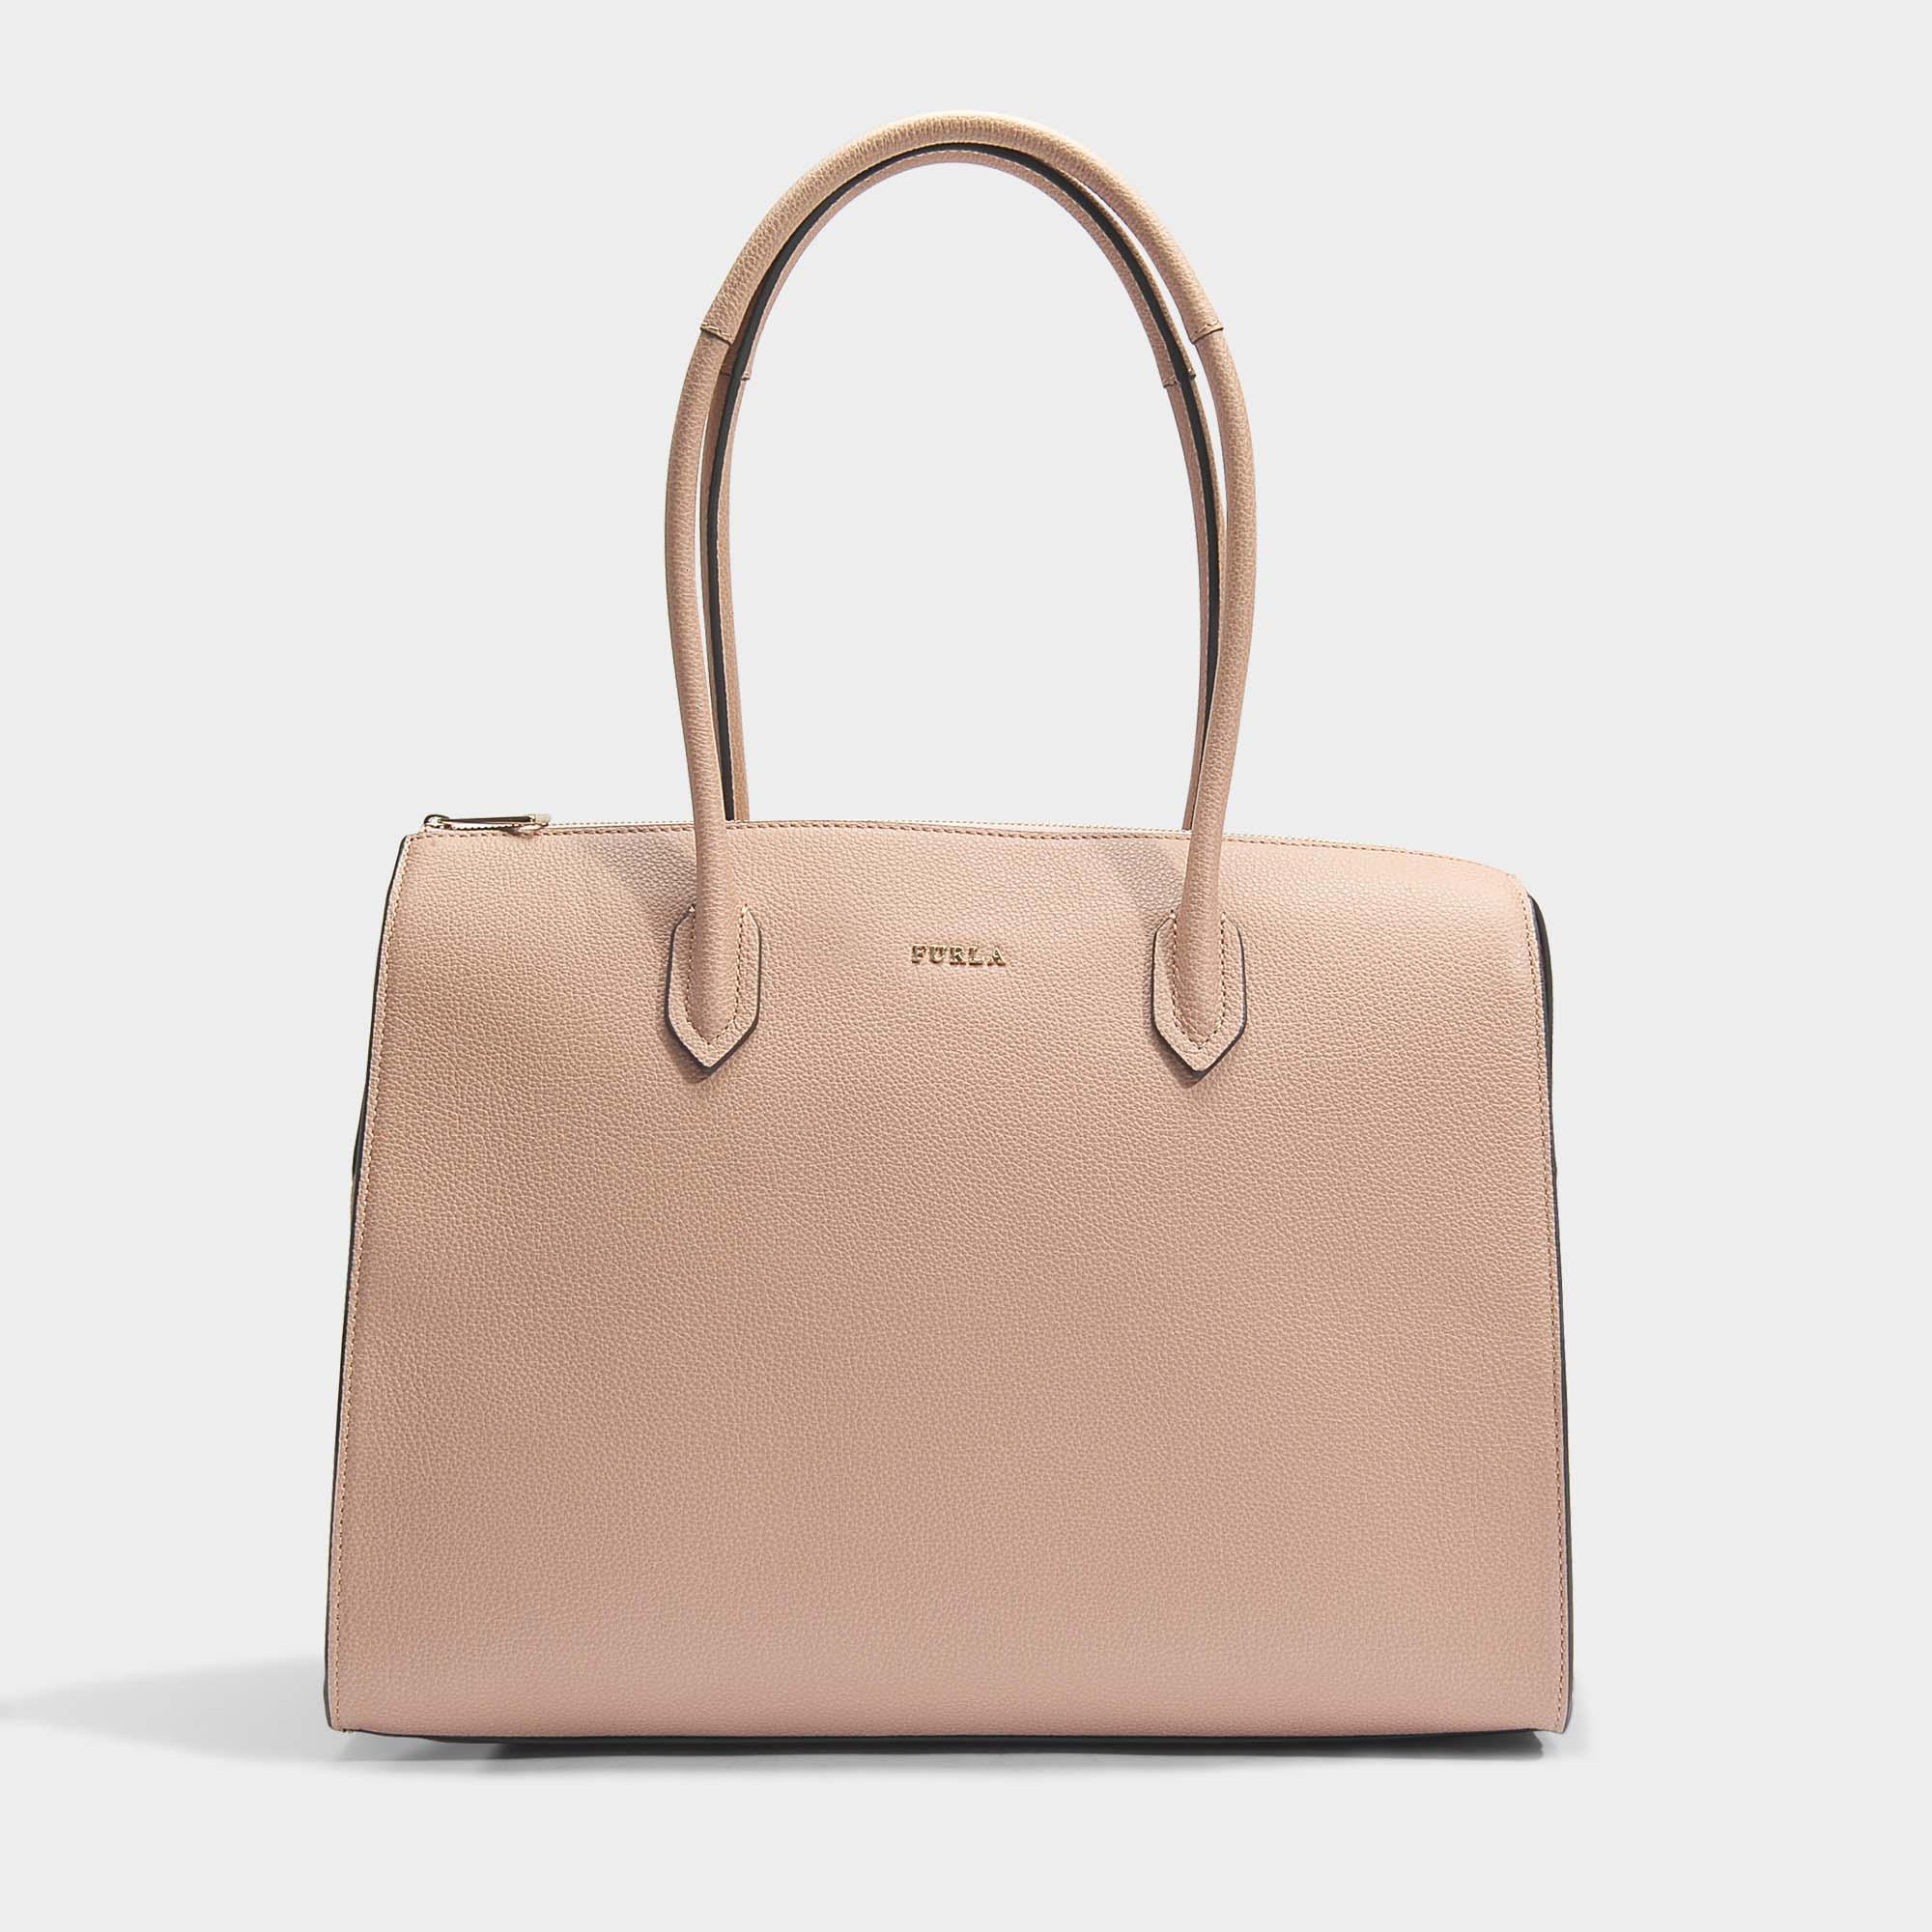 Sale Comfortable Pin L Satchel Bag in Onyx Calfskin Furla Outlet 2018 100% Original Cheap Online Amazon Cheap Price txQu1ro3x